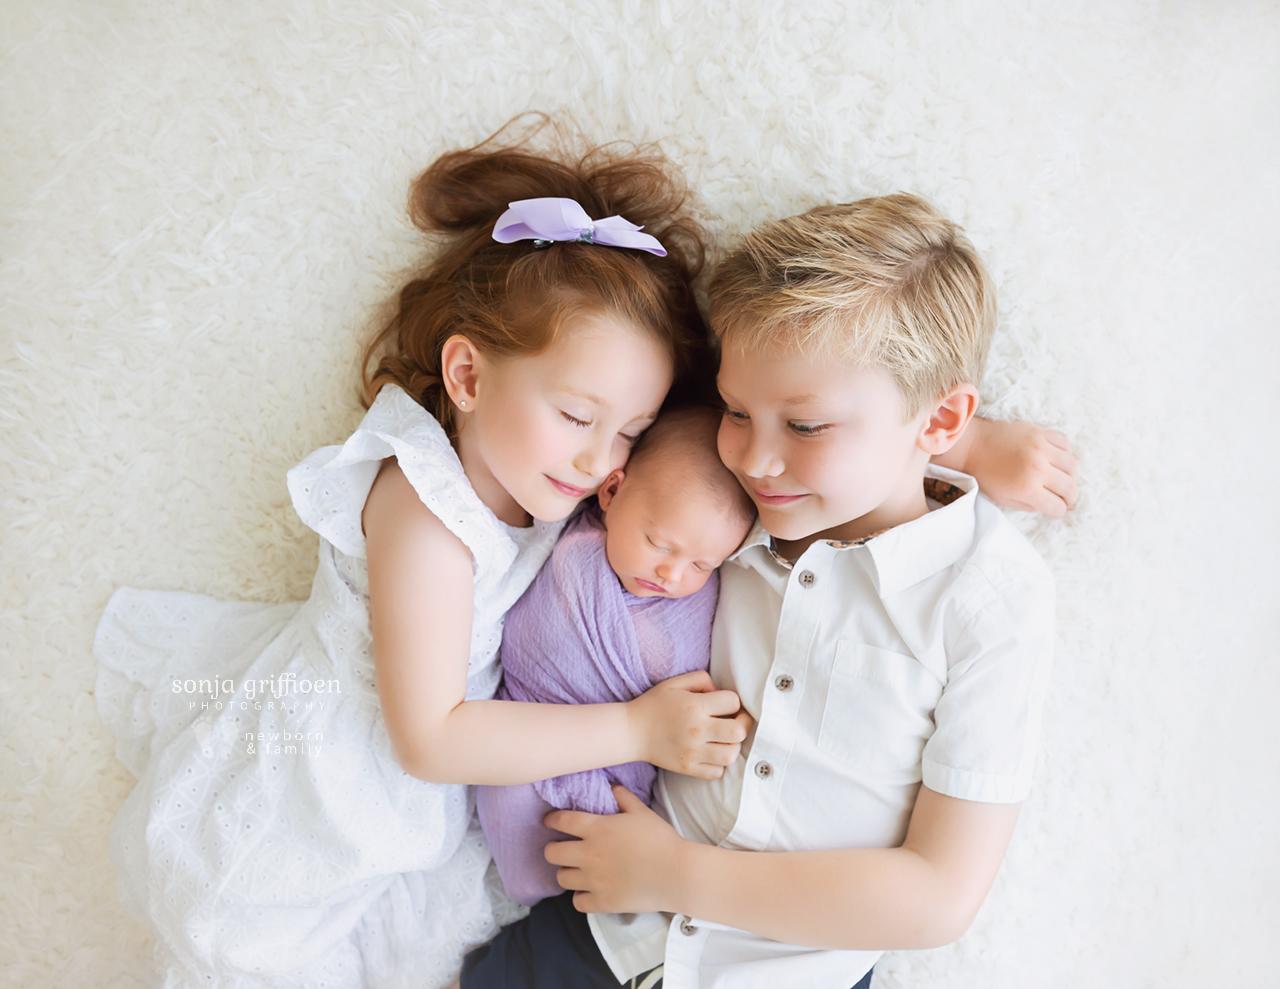 Macey-Newborn-Brisbane-Newborn-Photographer-Sonja-Griffioen-02.jpg